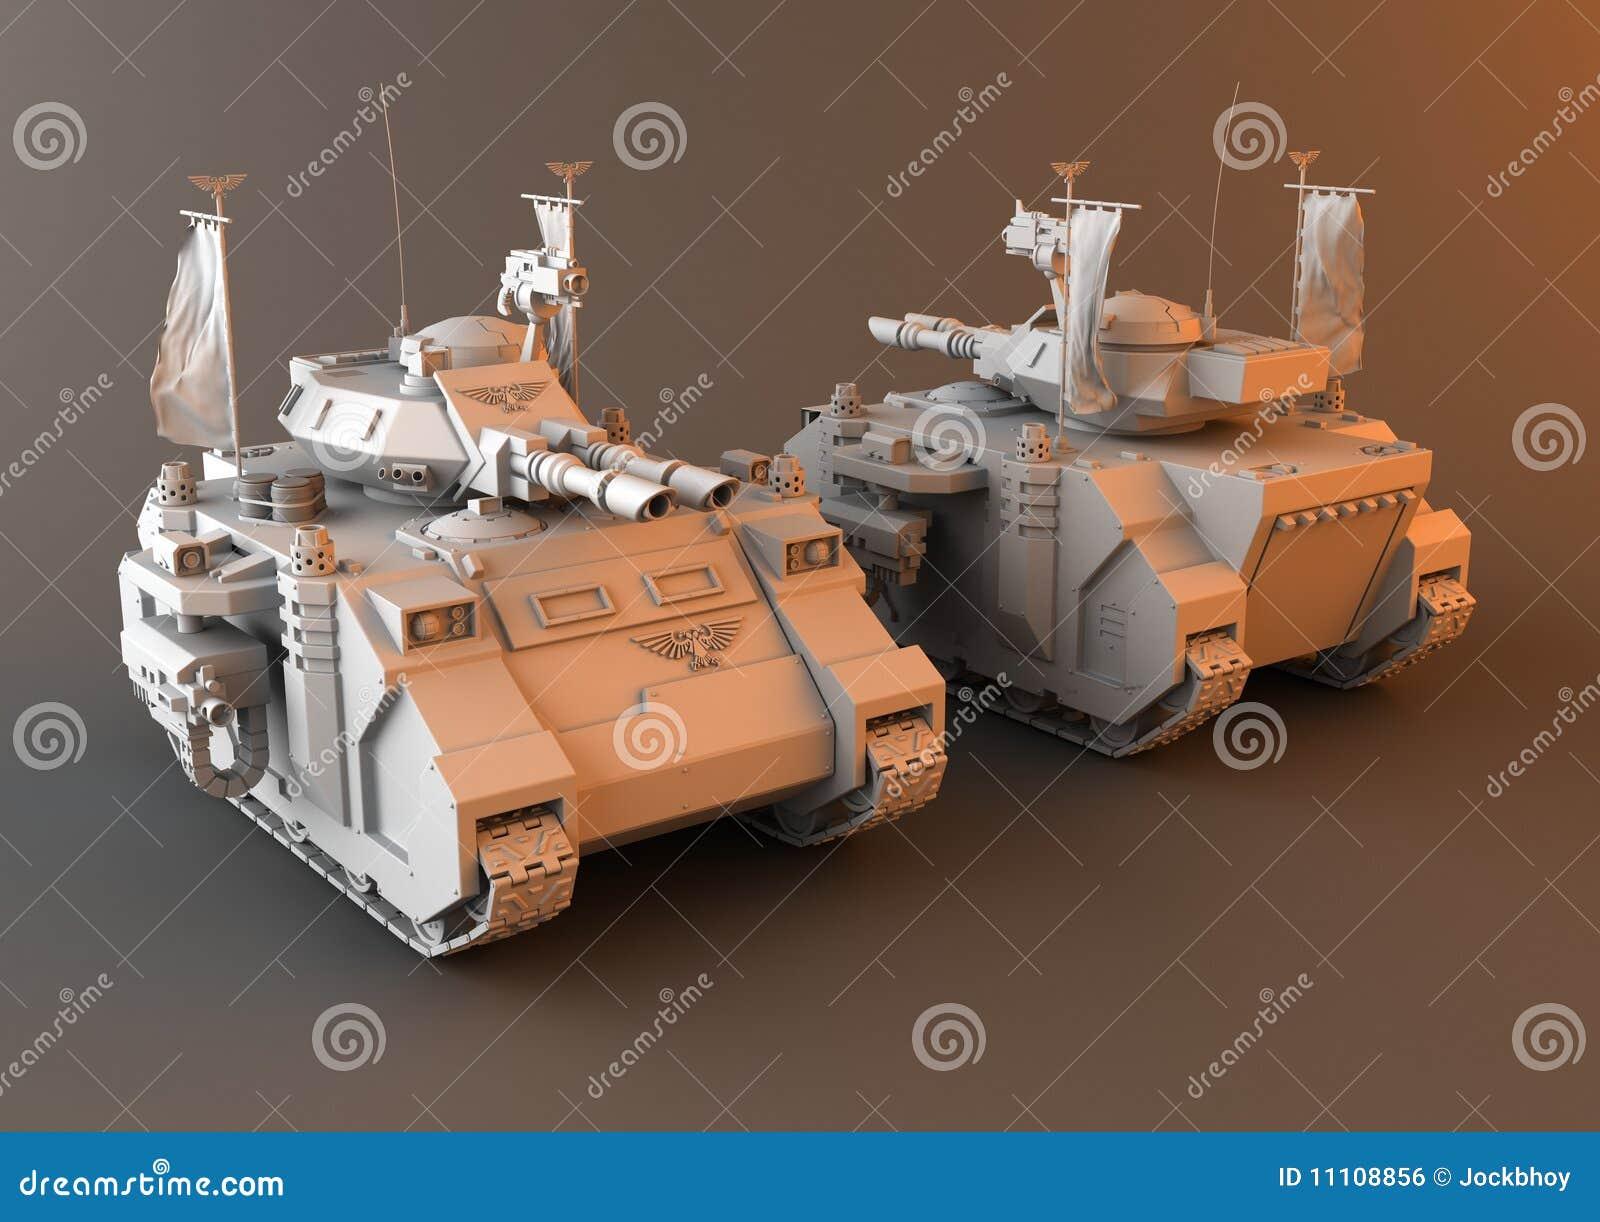 Futuristic Main Battle Tank